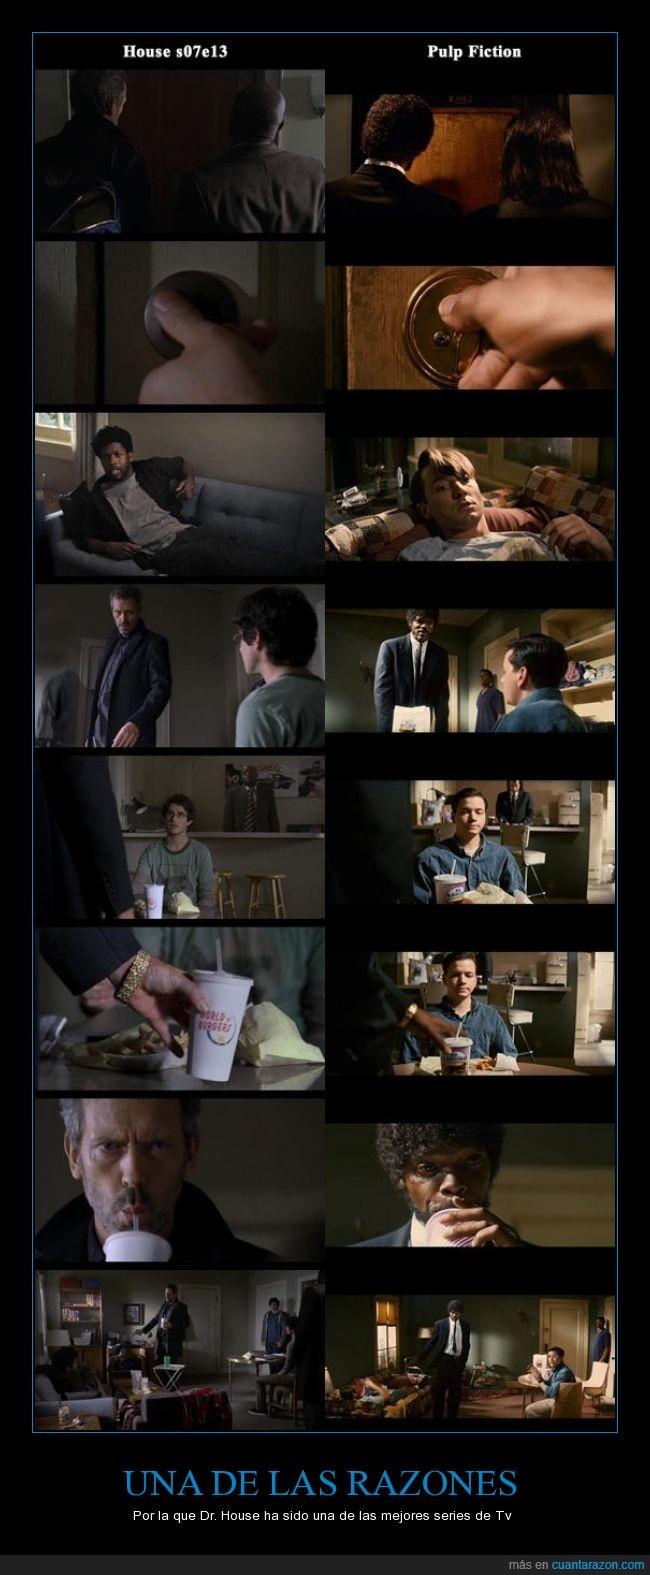 Dr. House,homenaje,la mejor,pulp fiction,razones,series